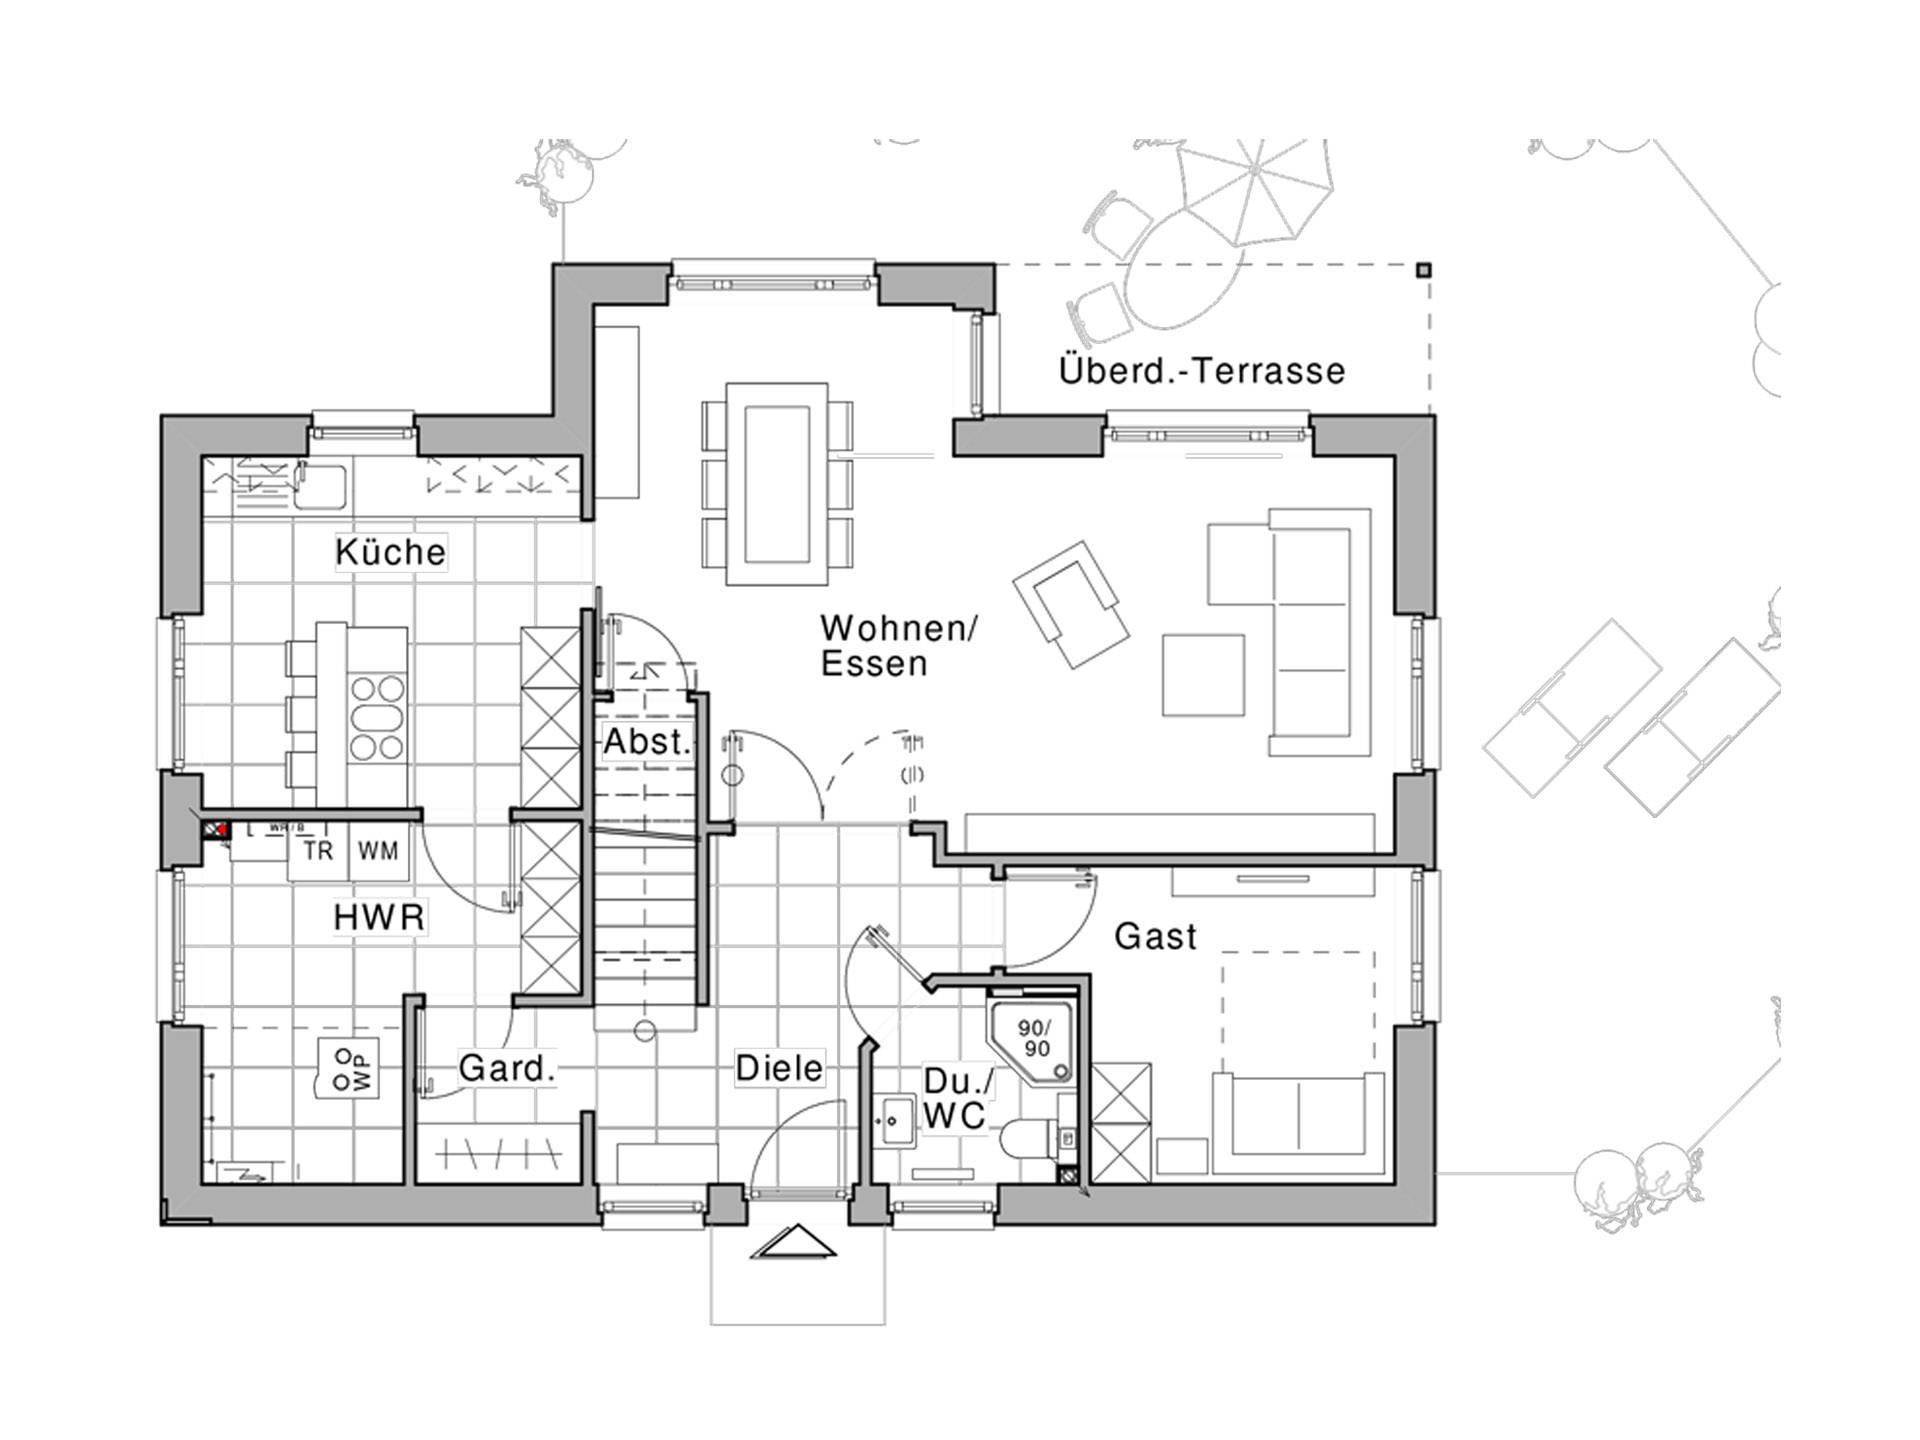 Haus edition 220 viebrockhaus for Muster grundrisse haus